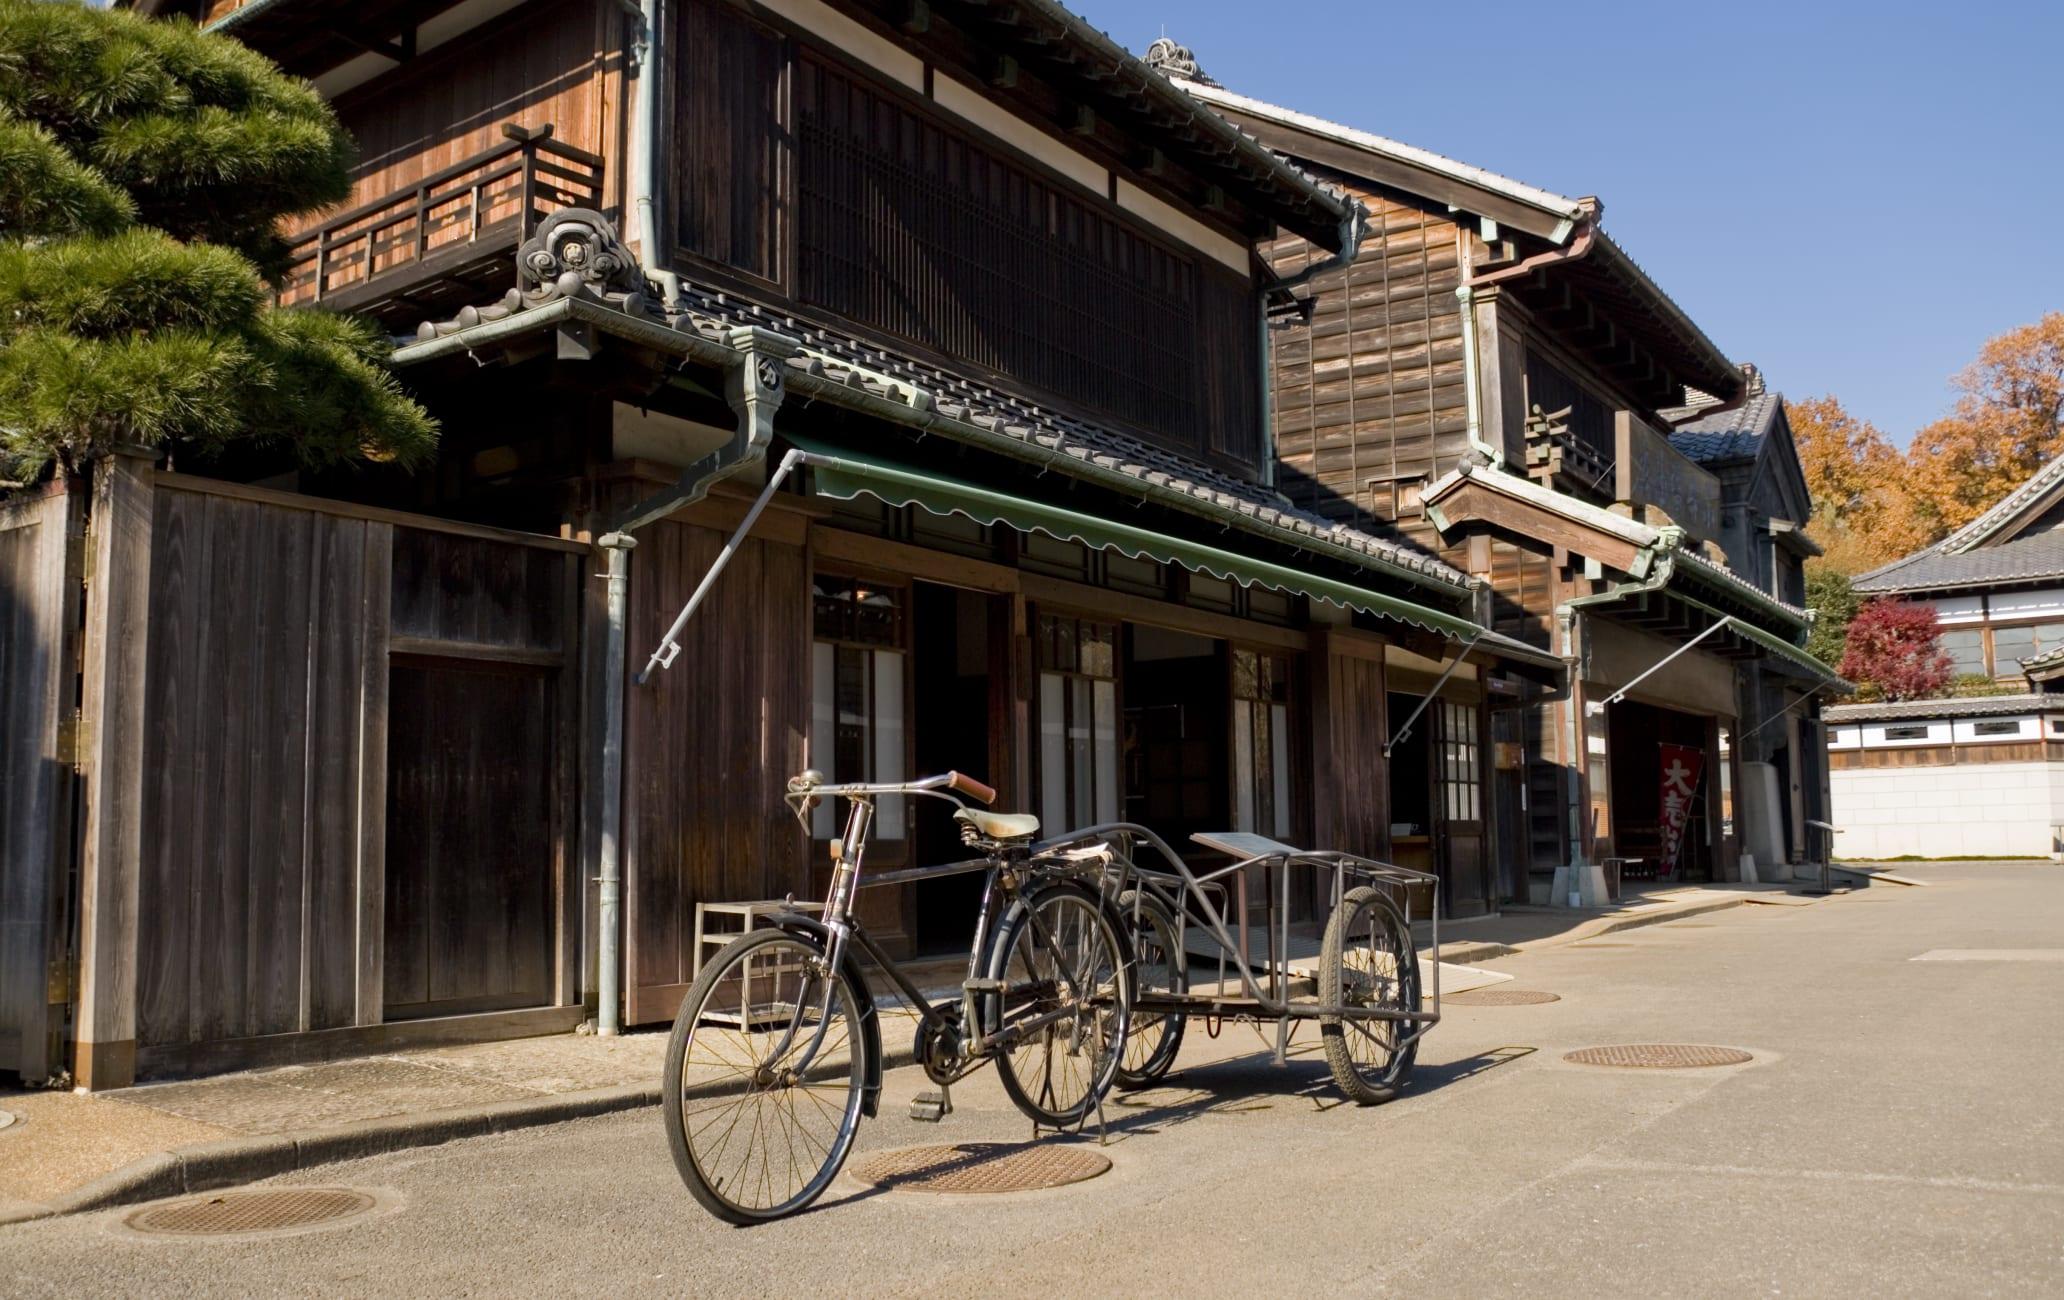 Edo Tokyo Open Air Architectural Museum